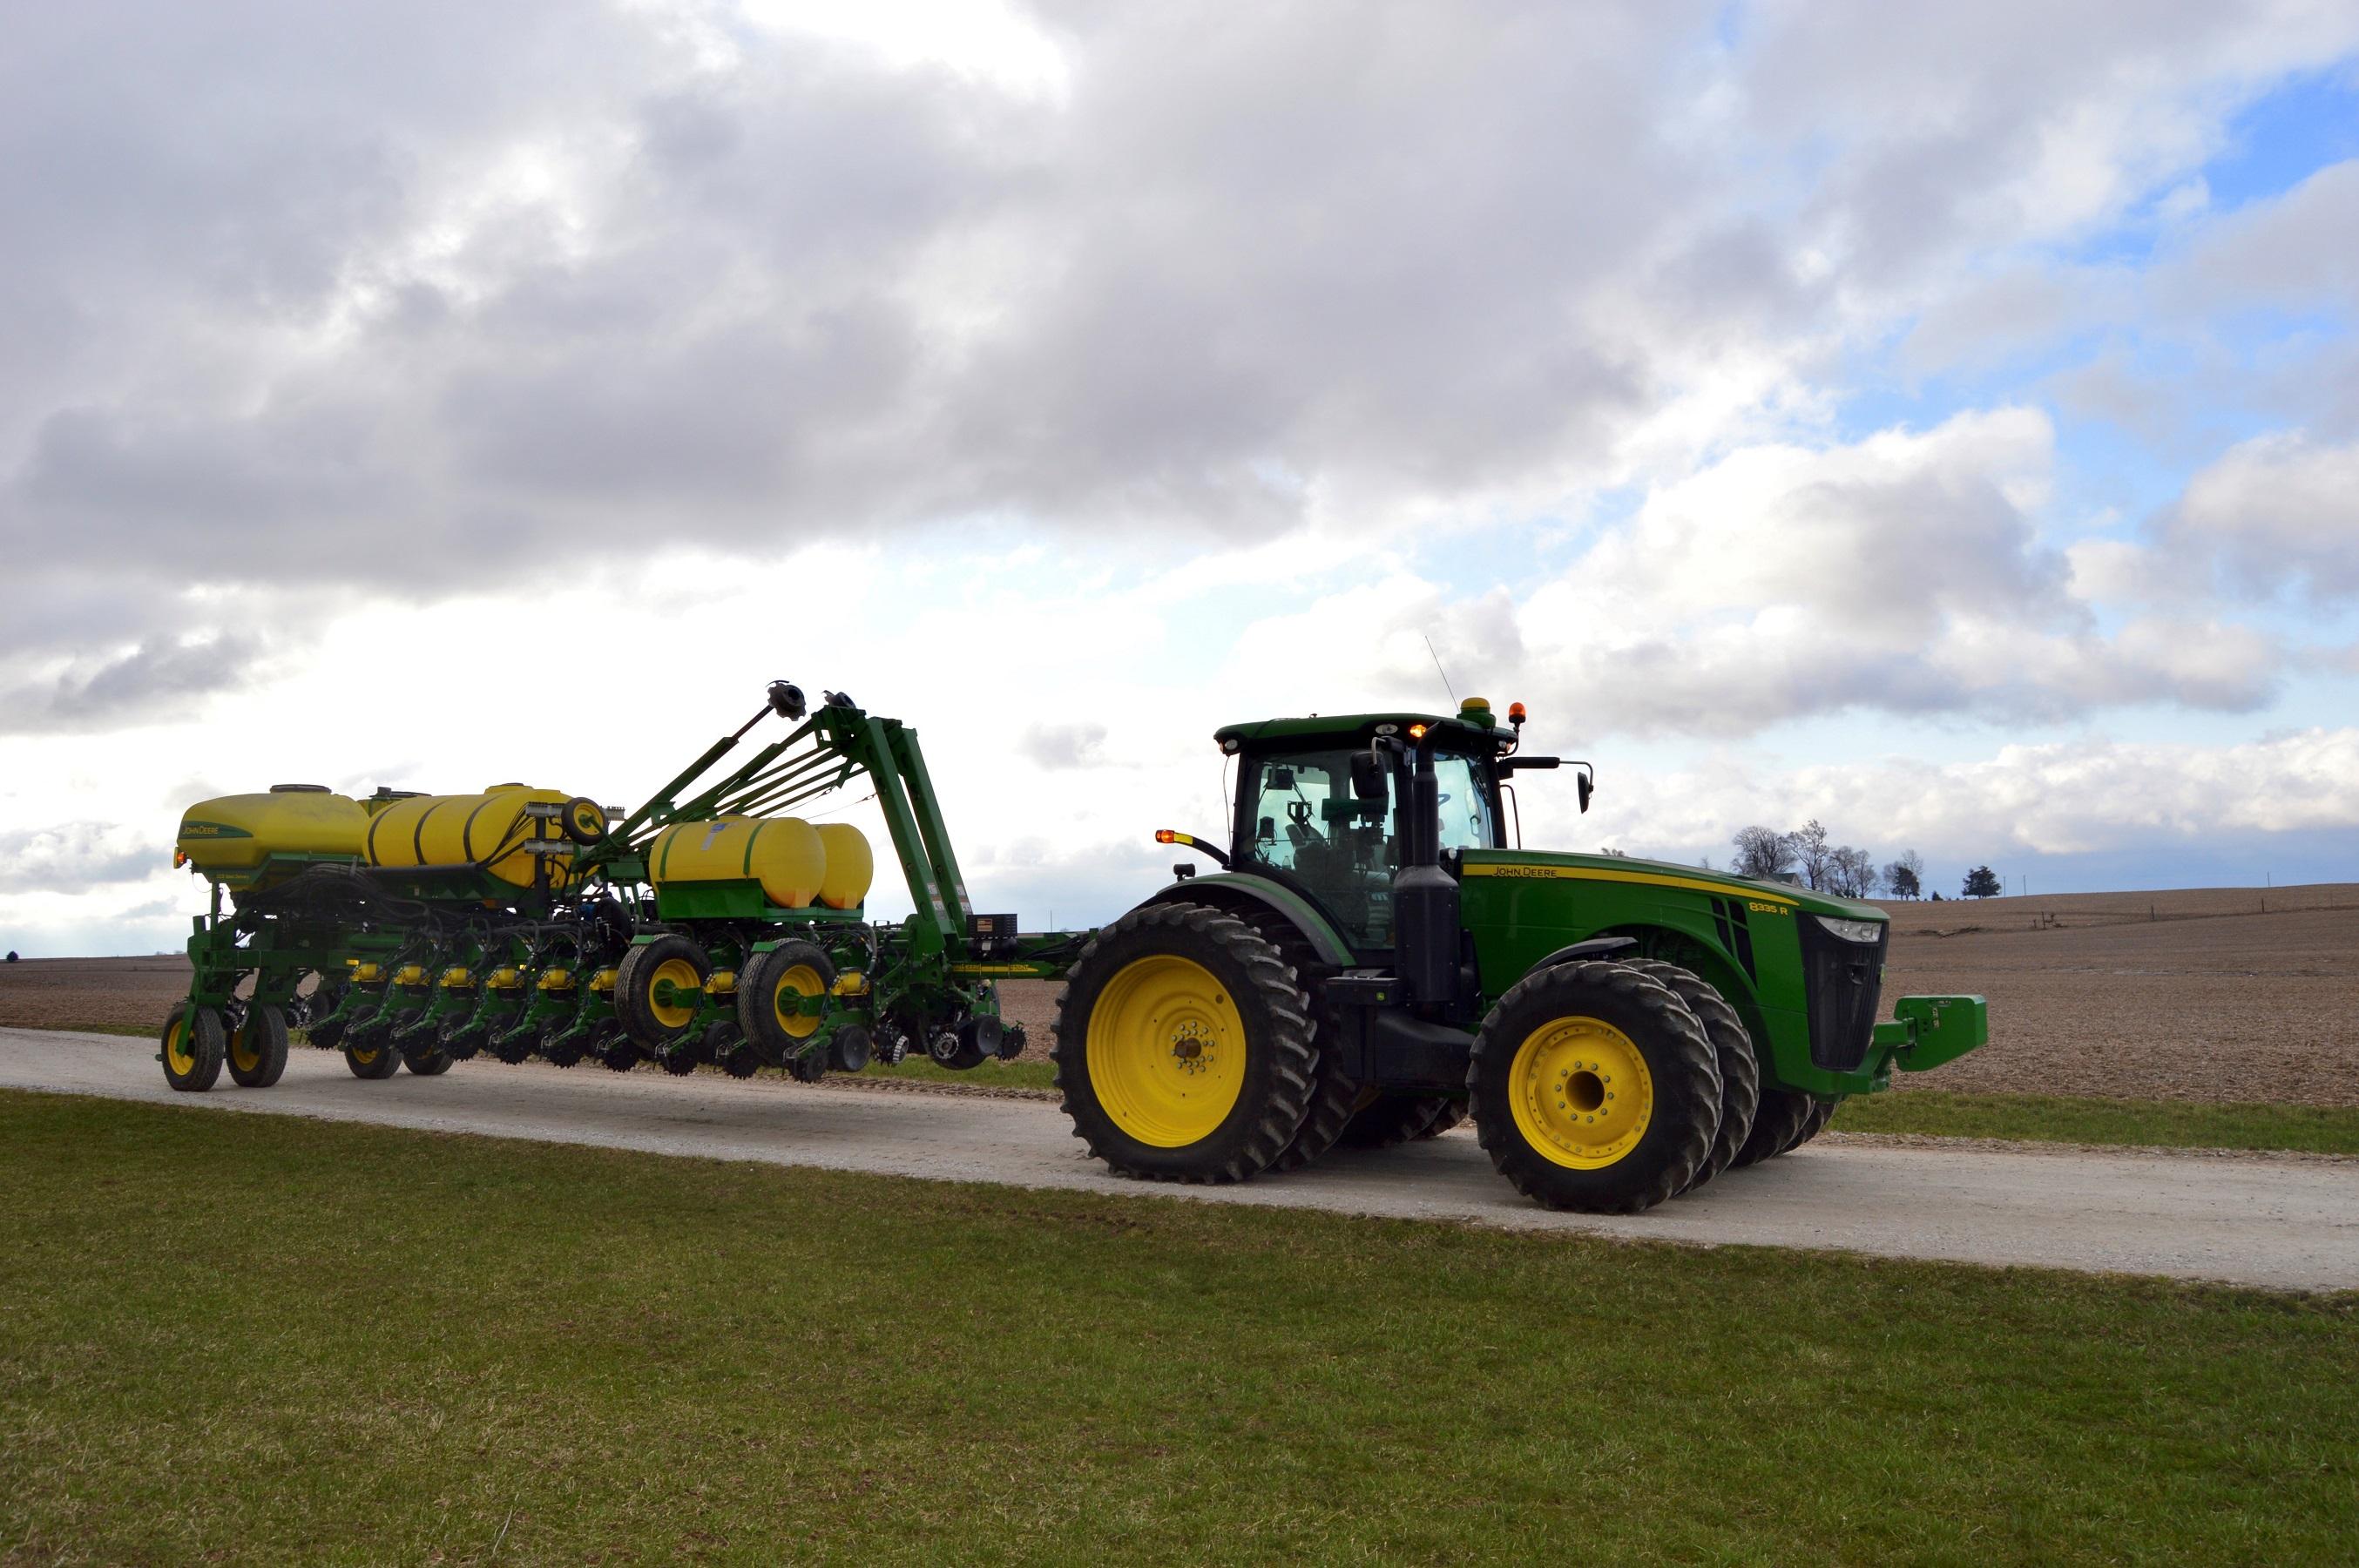 Hoosier Farmer May Lose Both Legs Following Farming Accident Monday